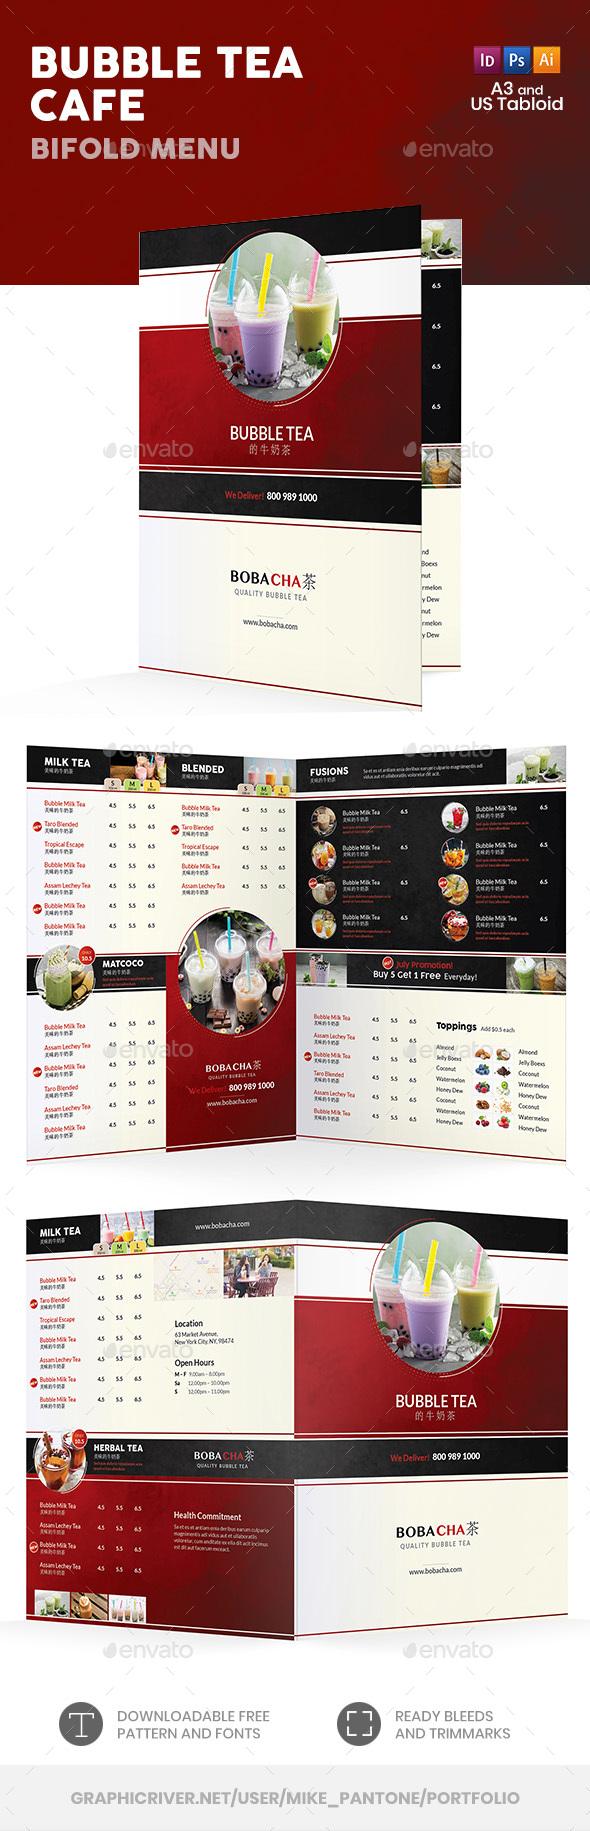 Bubble Tea Cafe Bifold / Halffold Menu 2 - Food Menus Print Templates